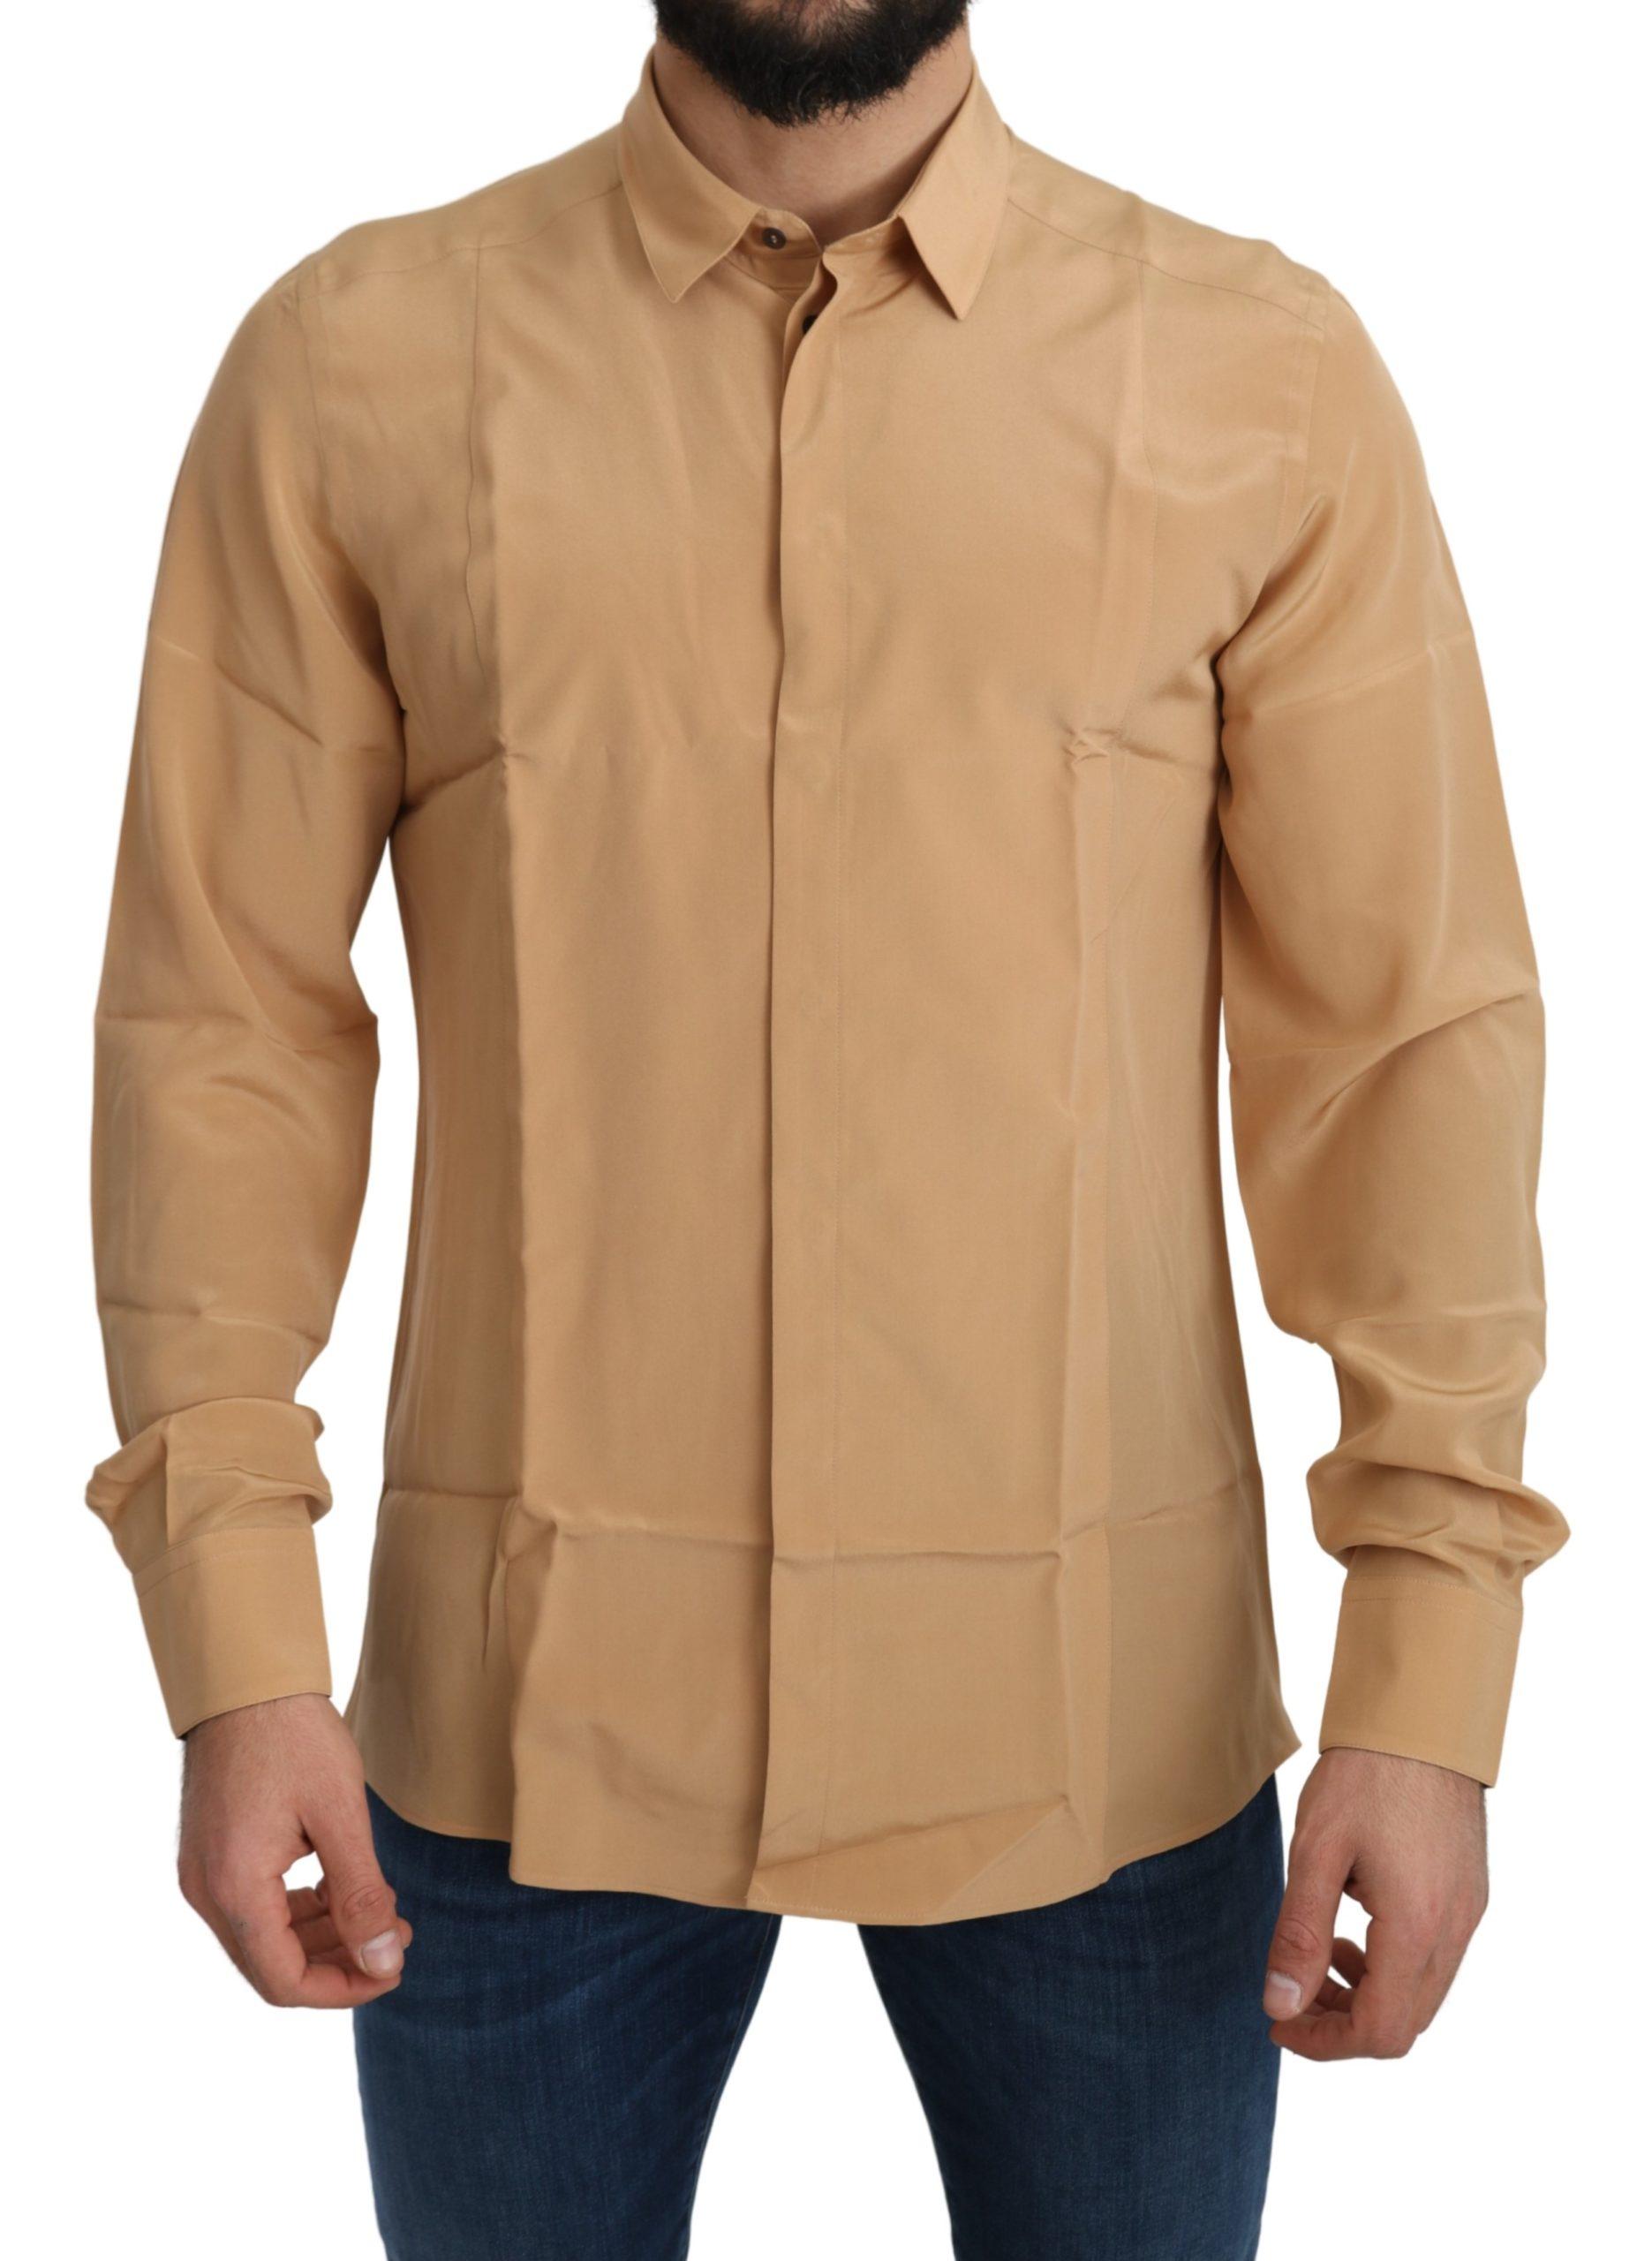 Dolce & Gabbana Men's Silk Slim Shirt Yellow TSH5213 - IT40 | M